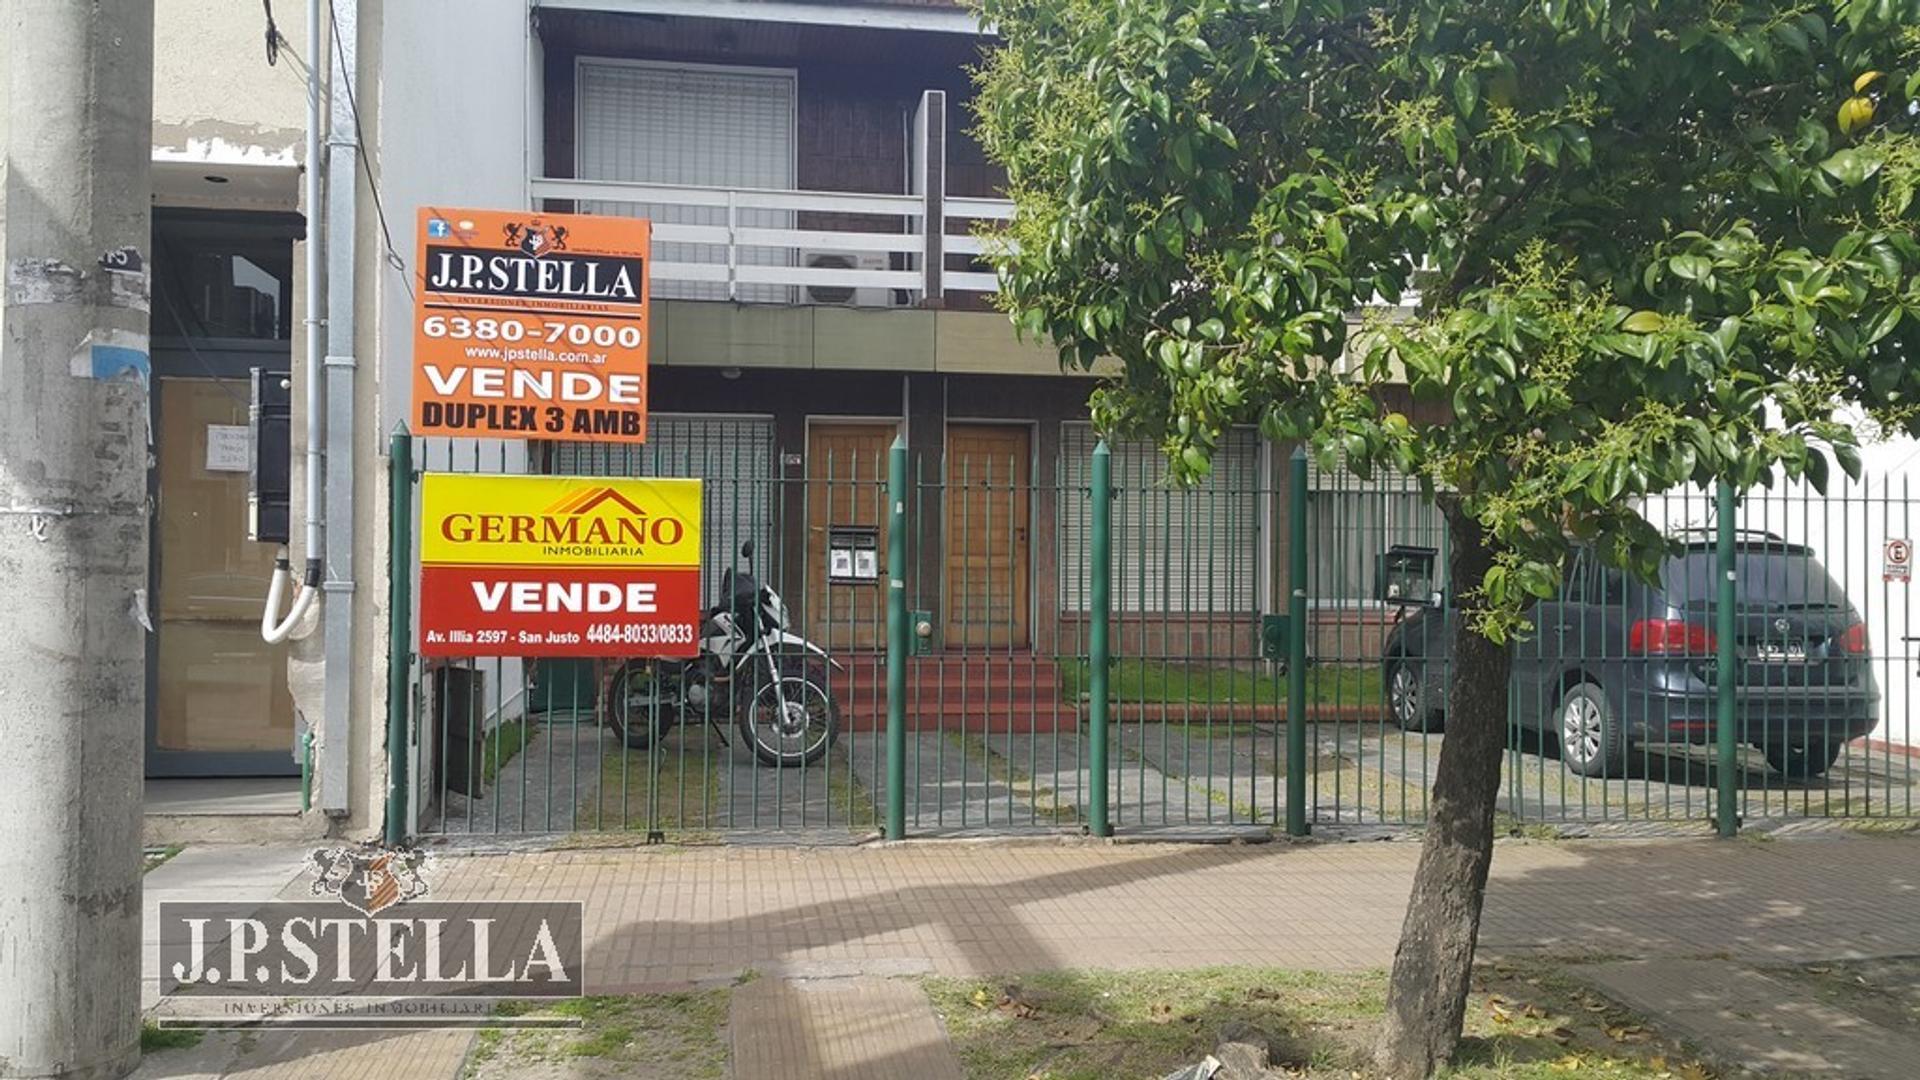 DUPLEX 3 AMB C/Entrada de Auto -APTO CREDITO - Av. Pte. Juan D. Peron 3274 - San Justo (CTRO)